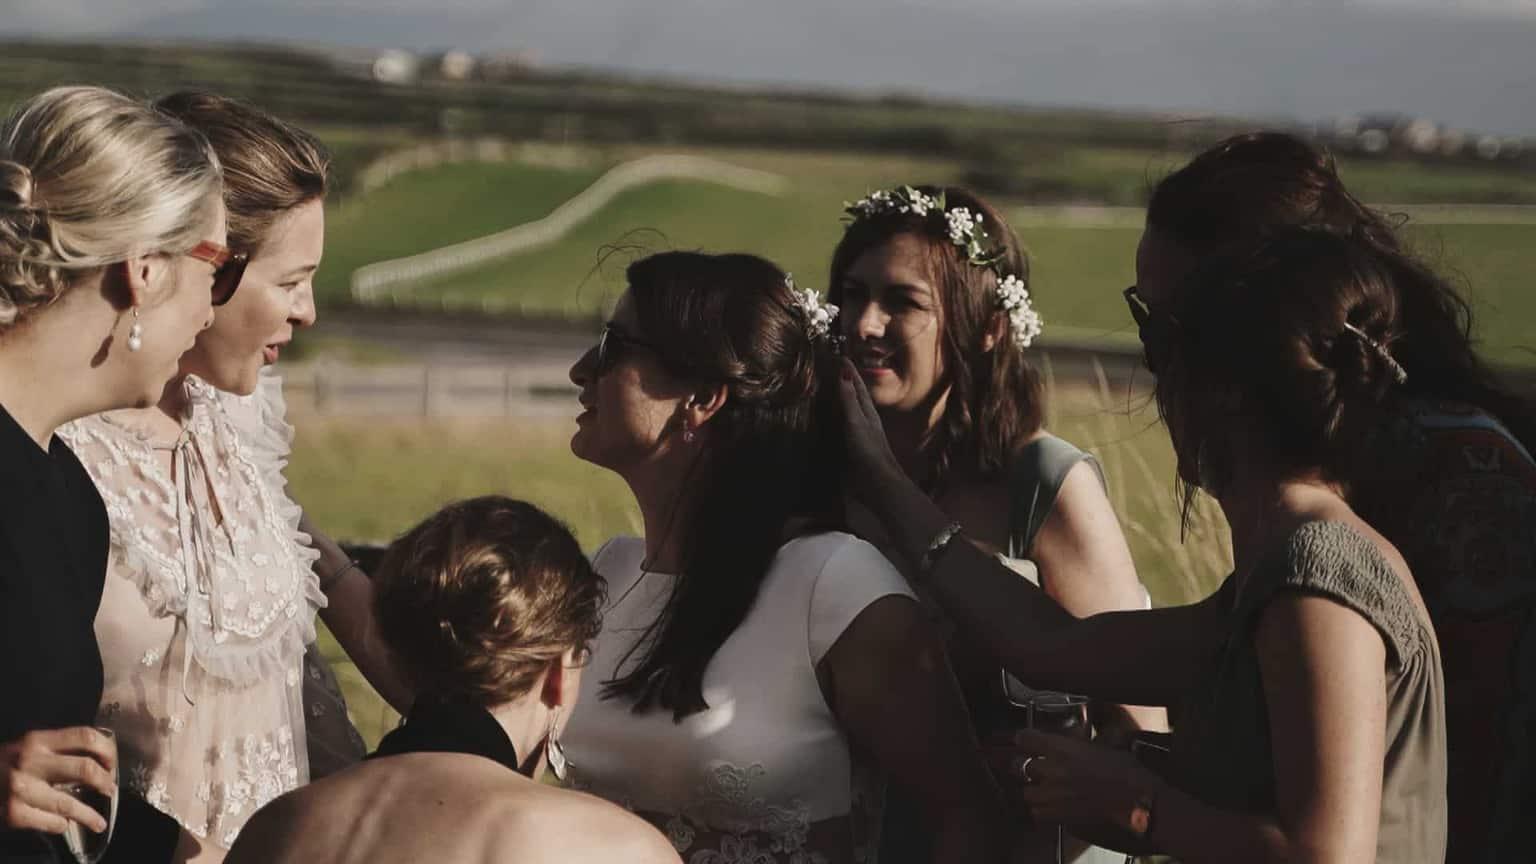 Friends admiring new Bride